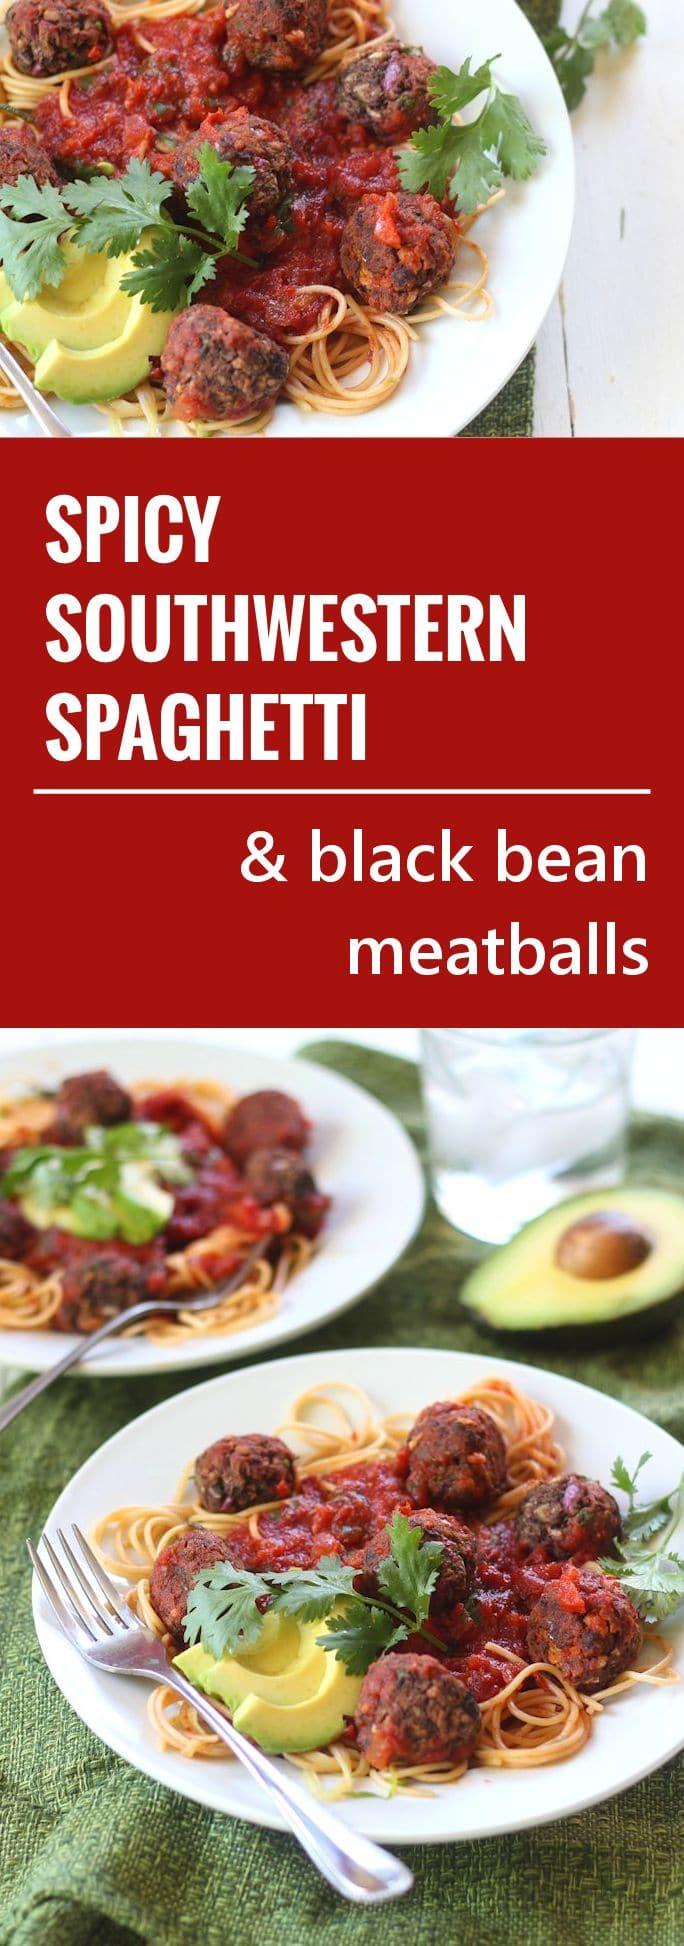 Spicy Southwestern Spaghetti with Avocado & Black Bean Meatballs